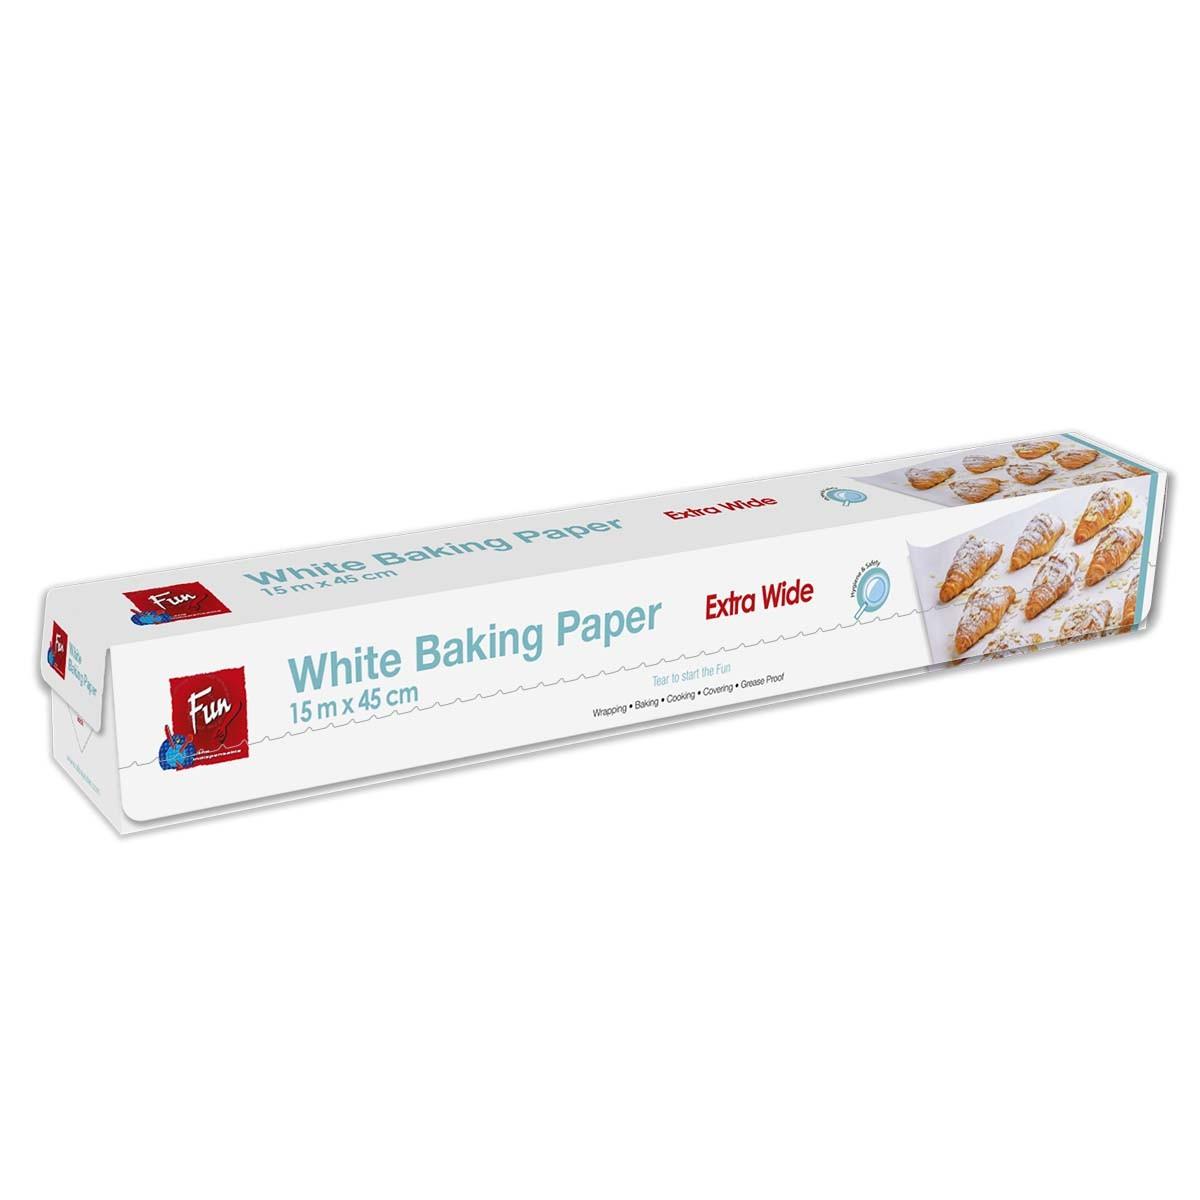 Fun® Silicon-Coated Baking Paper Roll 15mx45cm - White | 1rlx12pkts